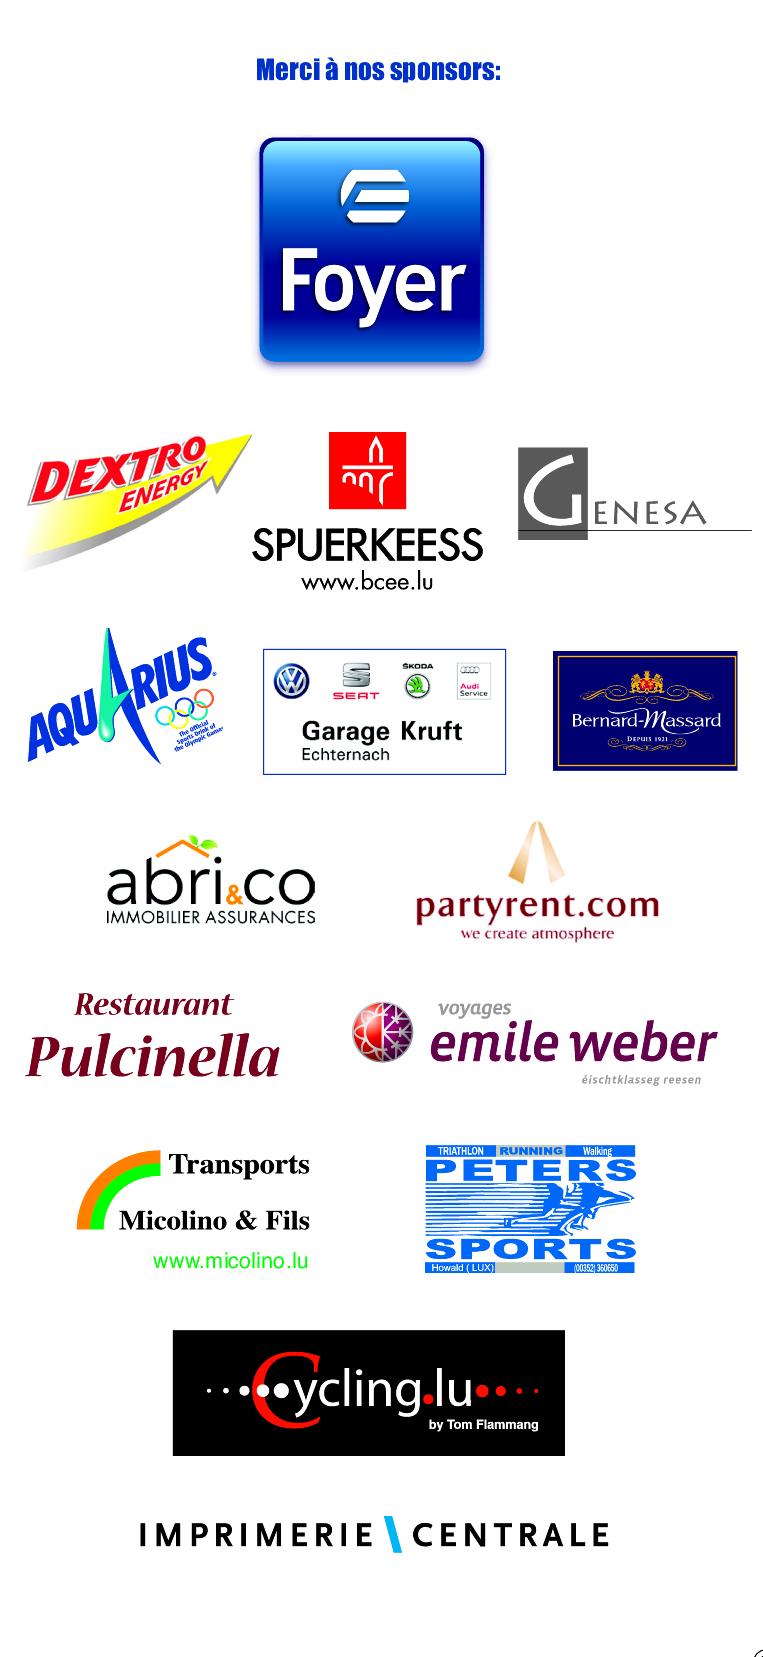 Depliant-TIE-2014-sponsors.jpg